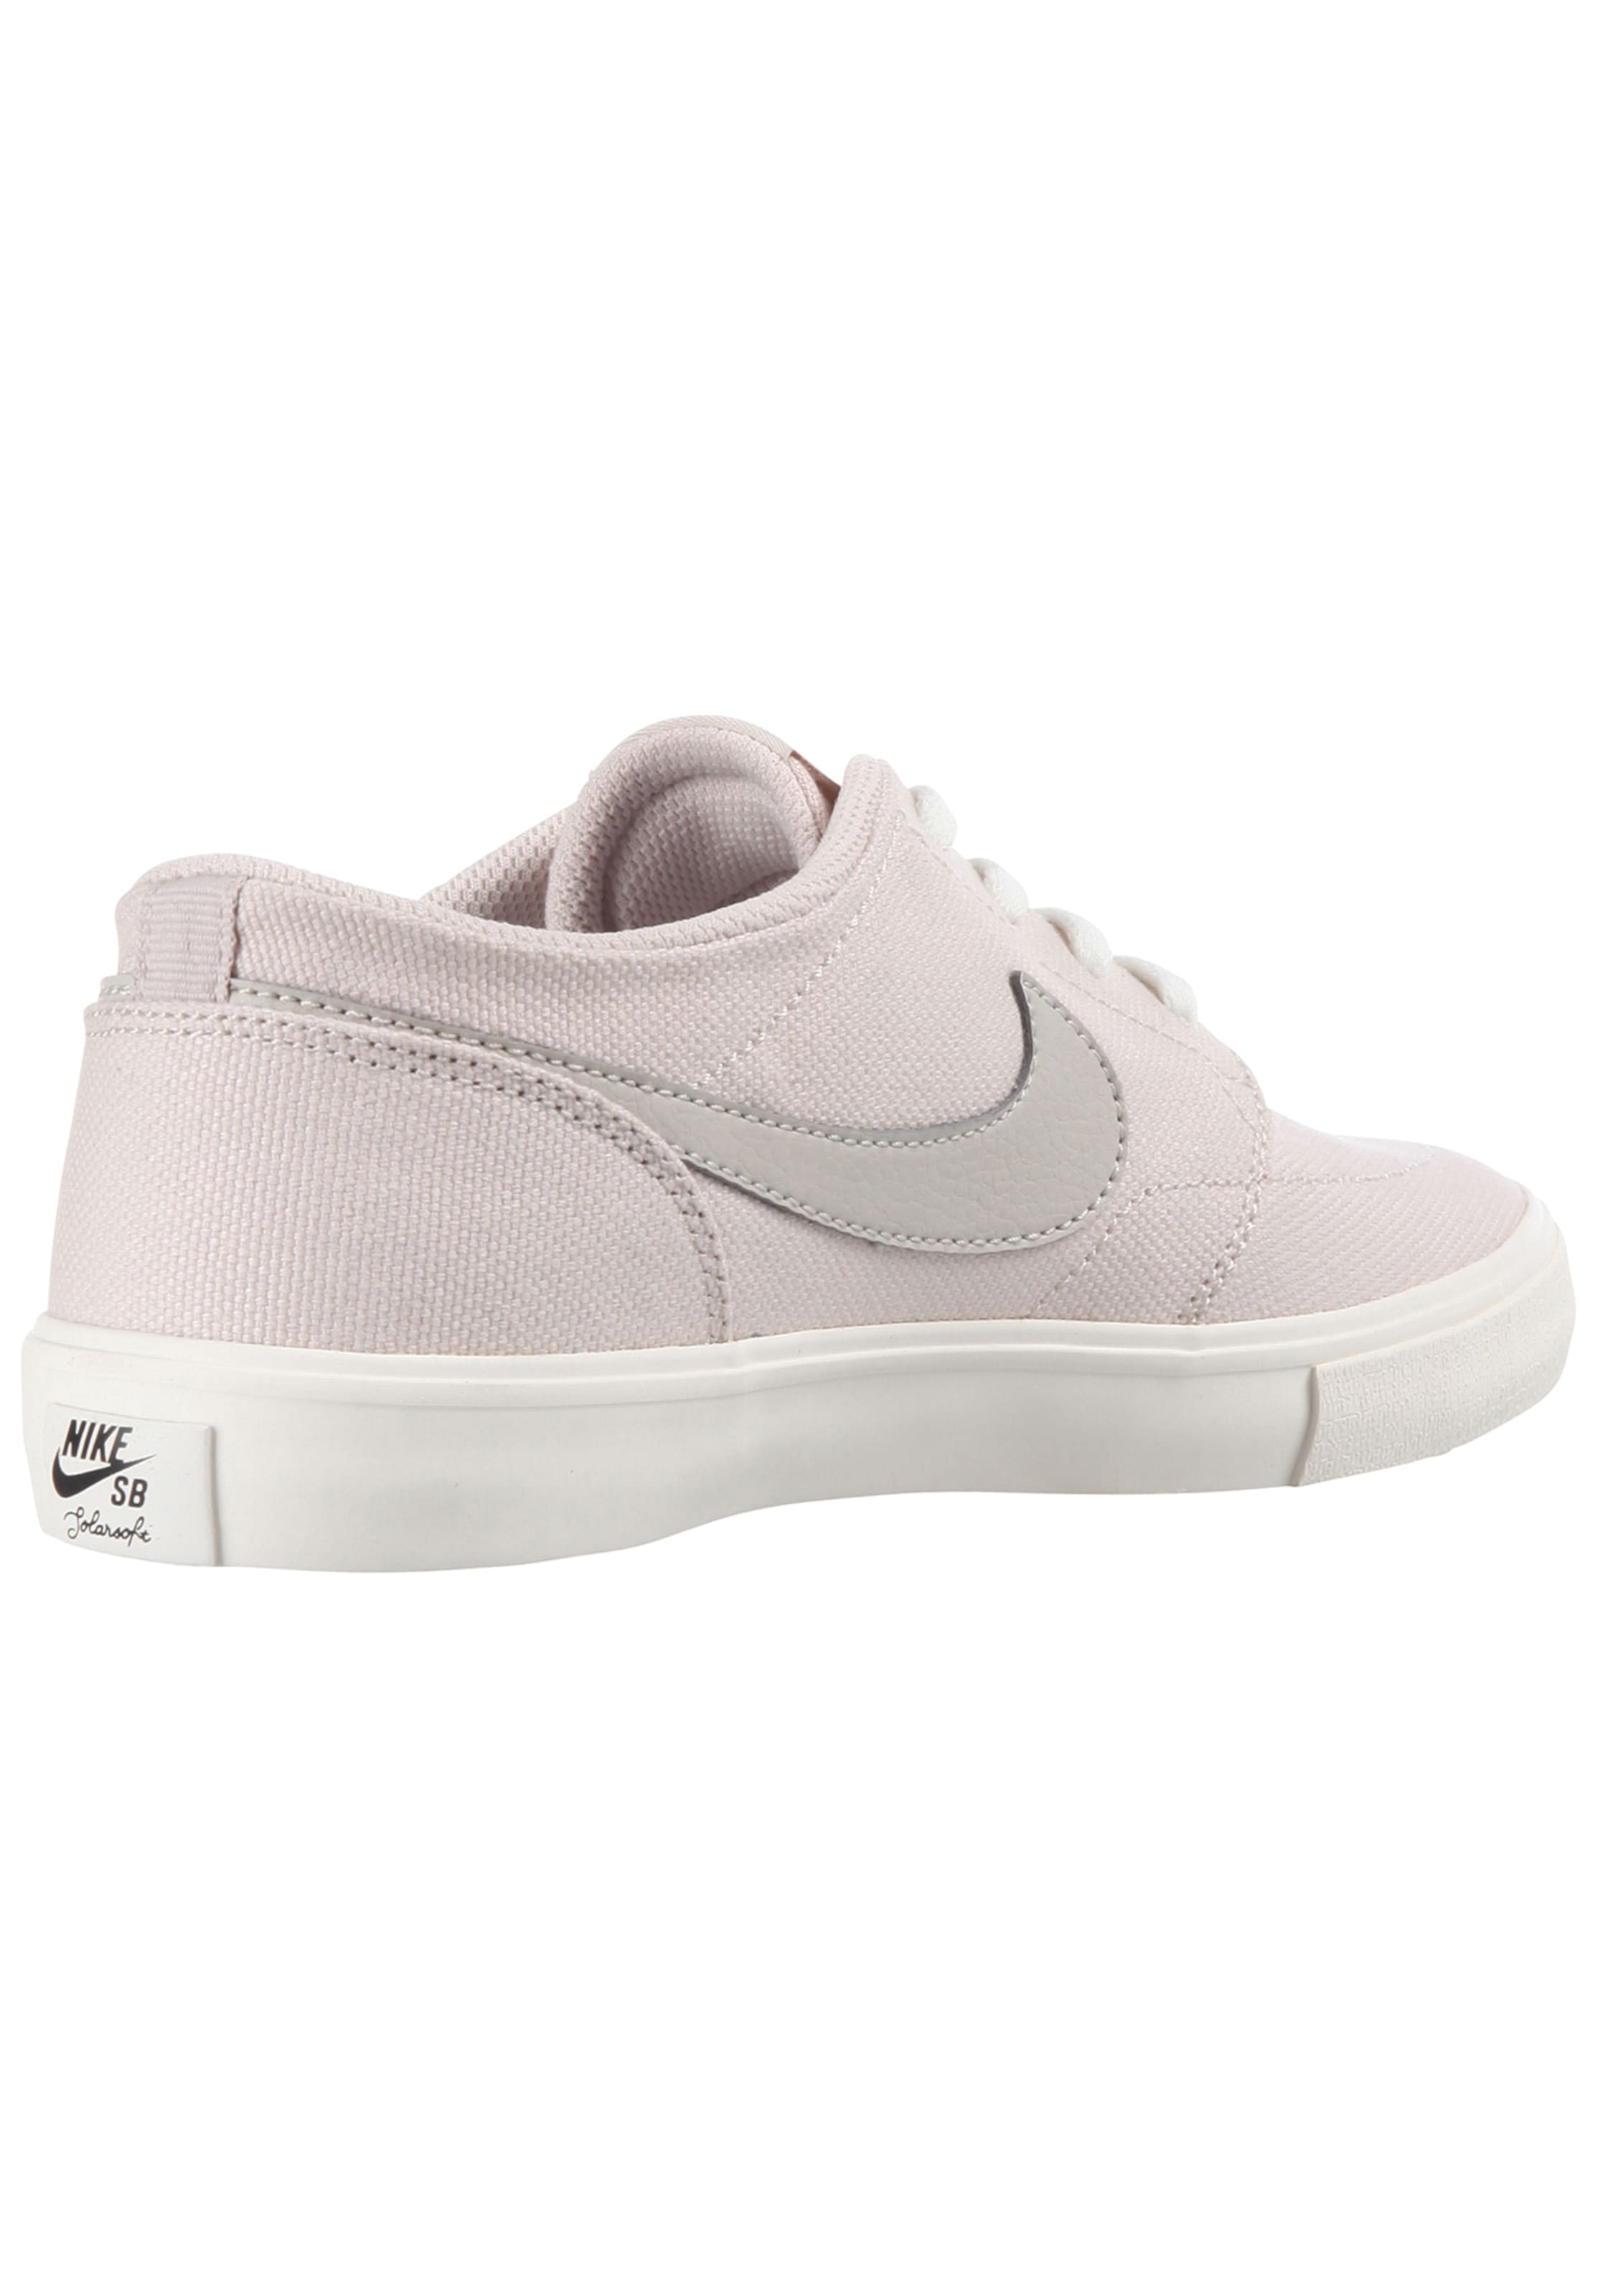 Sneaker HellgrauPastellpink Sb Ii C' 'portmore Nike Slr In xdCroBeW